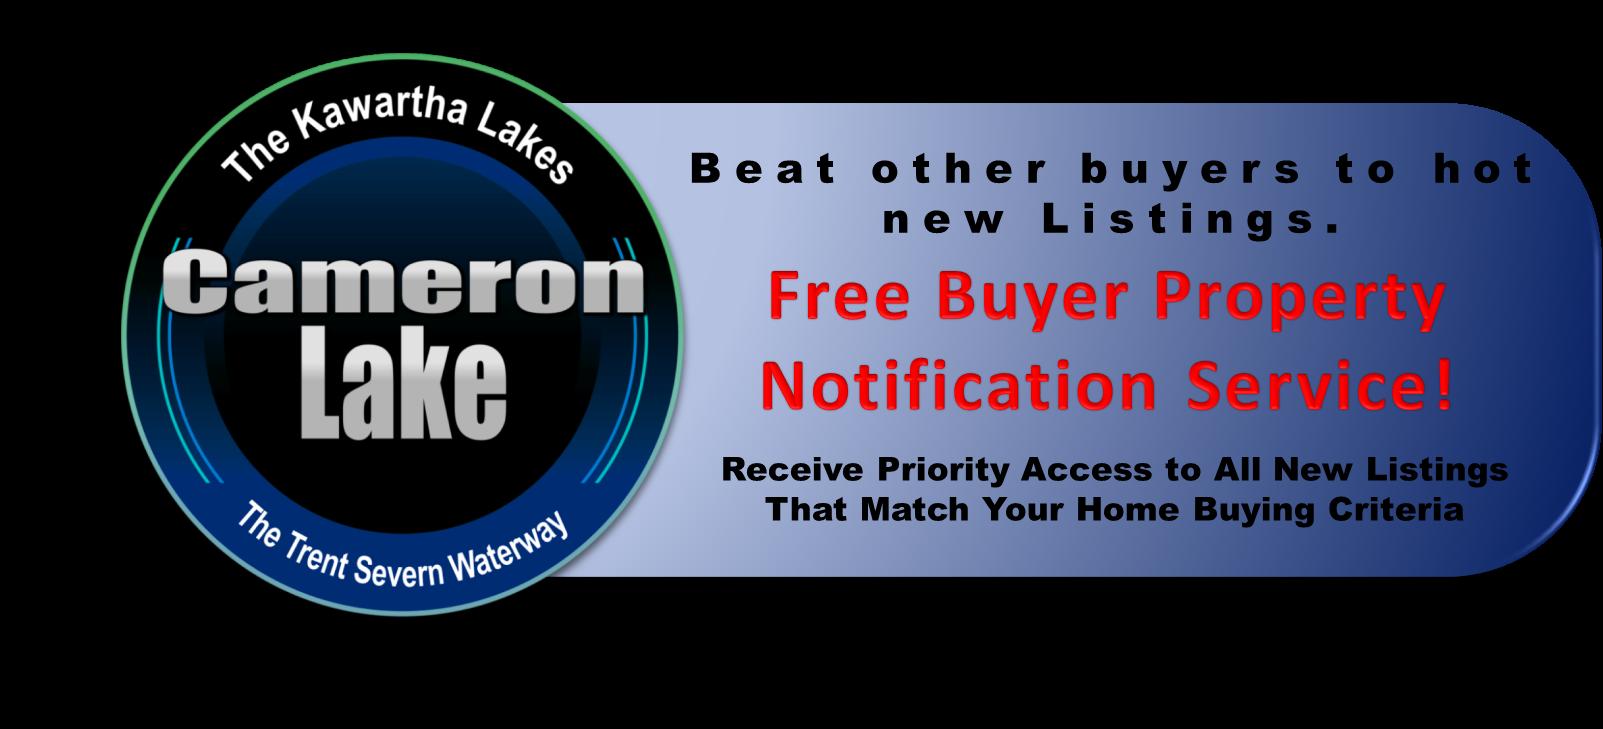 Cameron Lake Real Estate - Waterfront Listing Notification Service